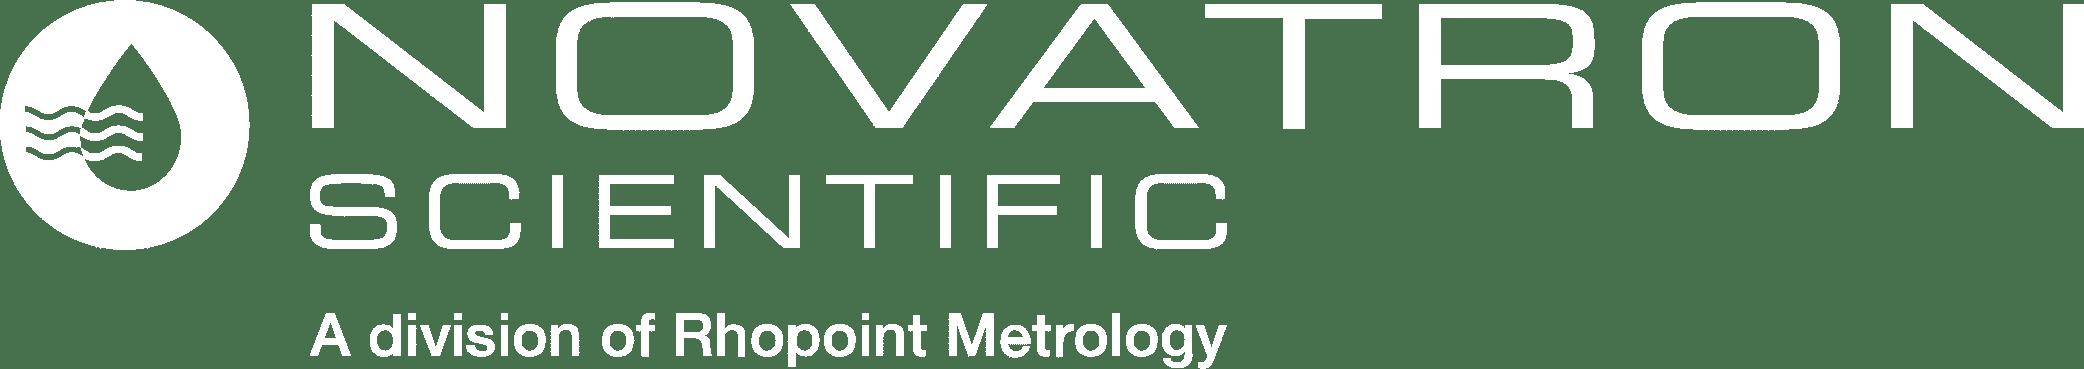 Novatron Scientific logo